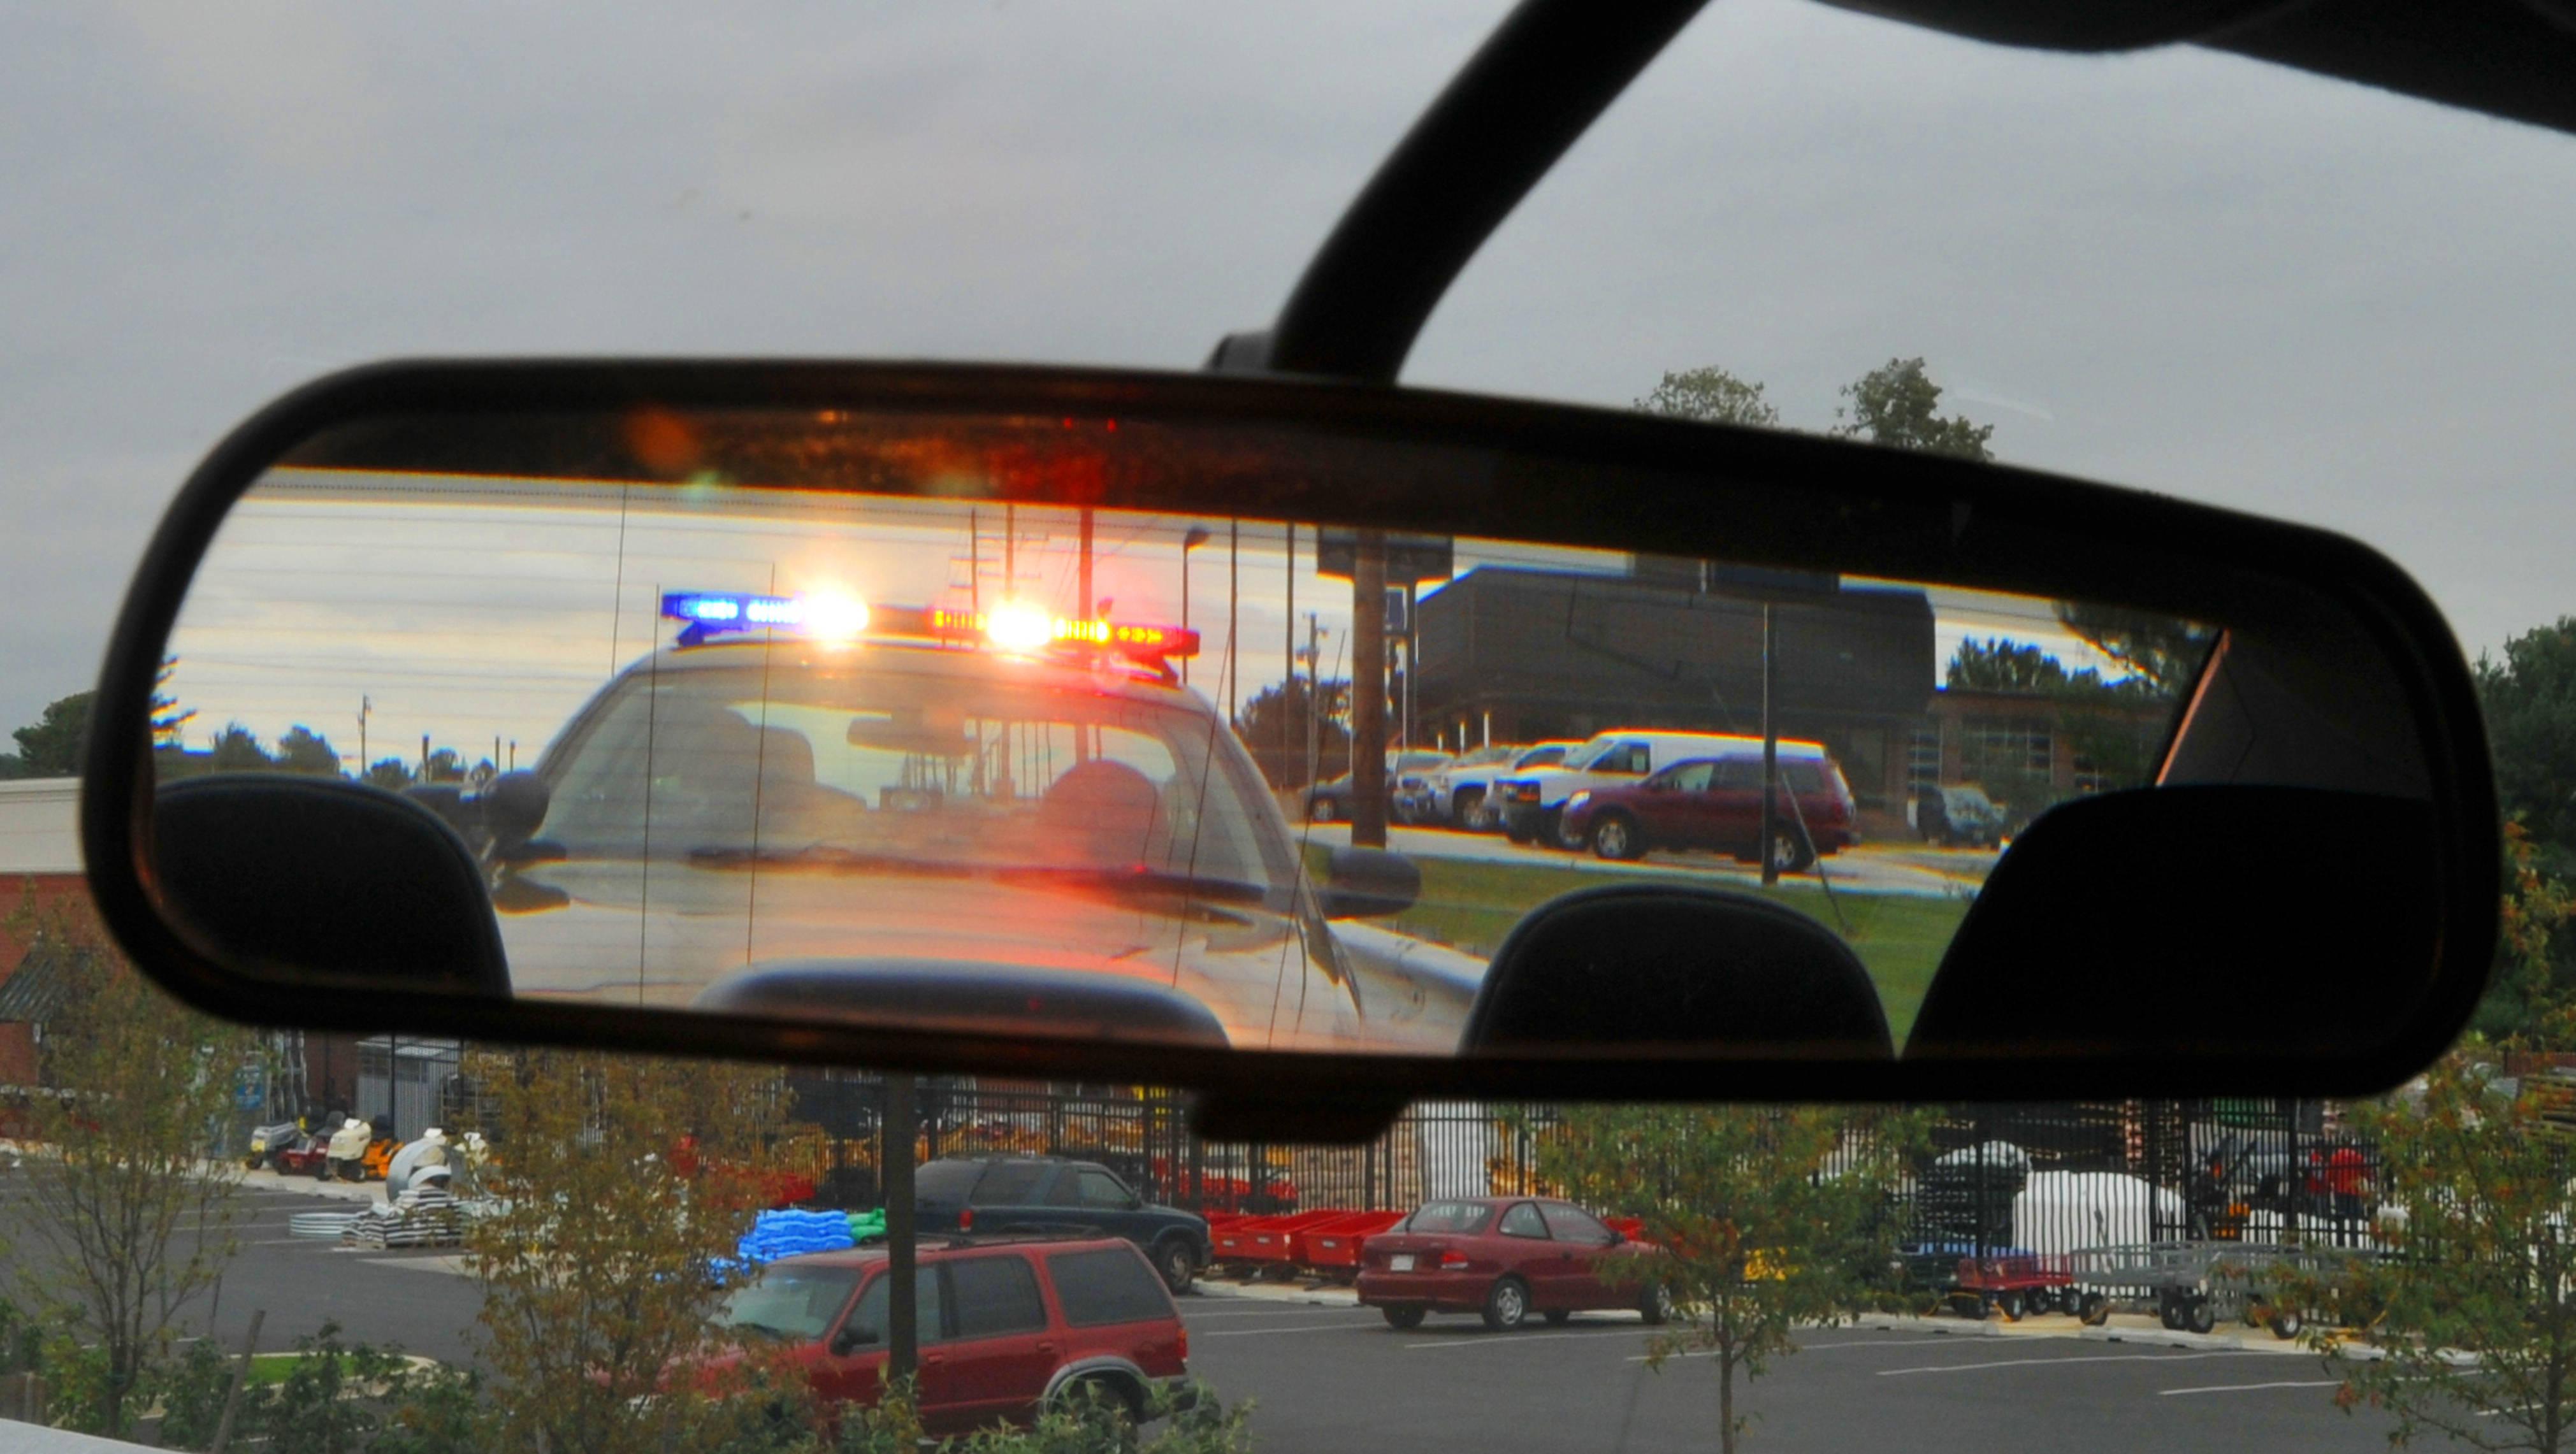 What should I do when I hear a siren while driving Car Advice